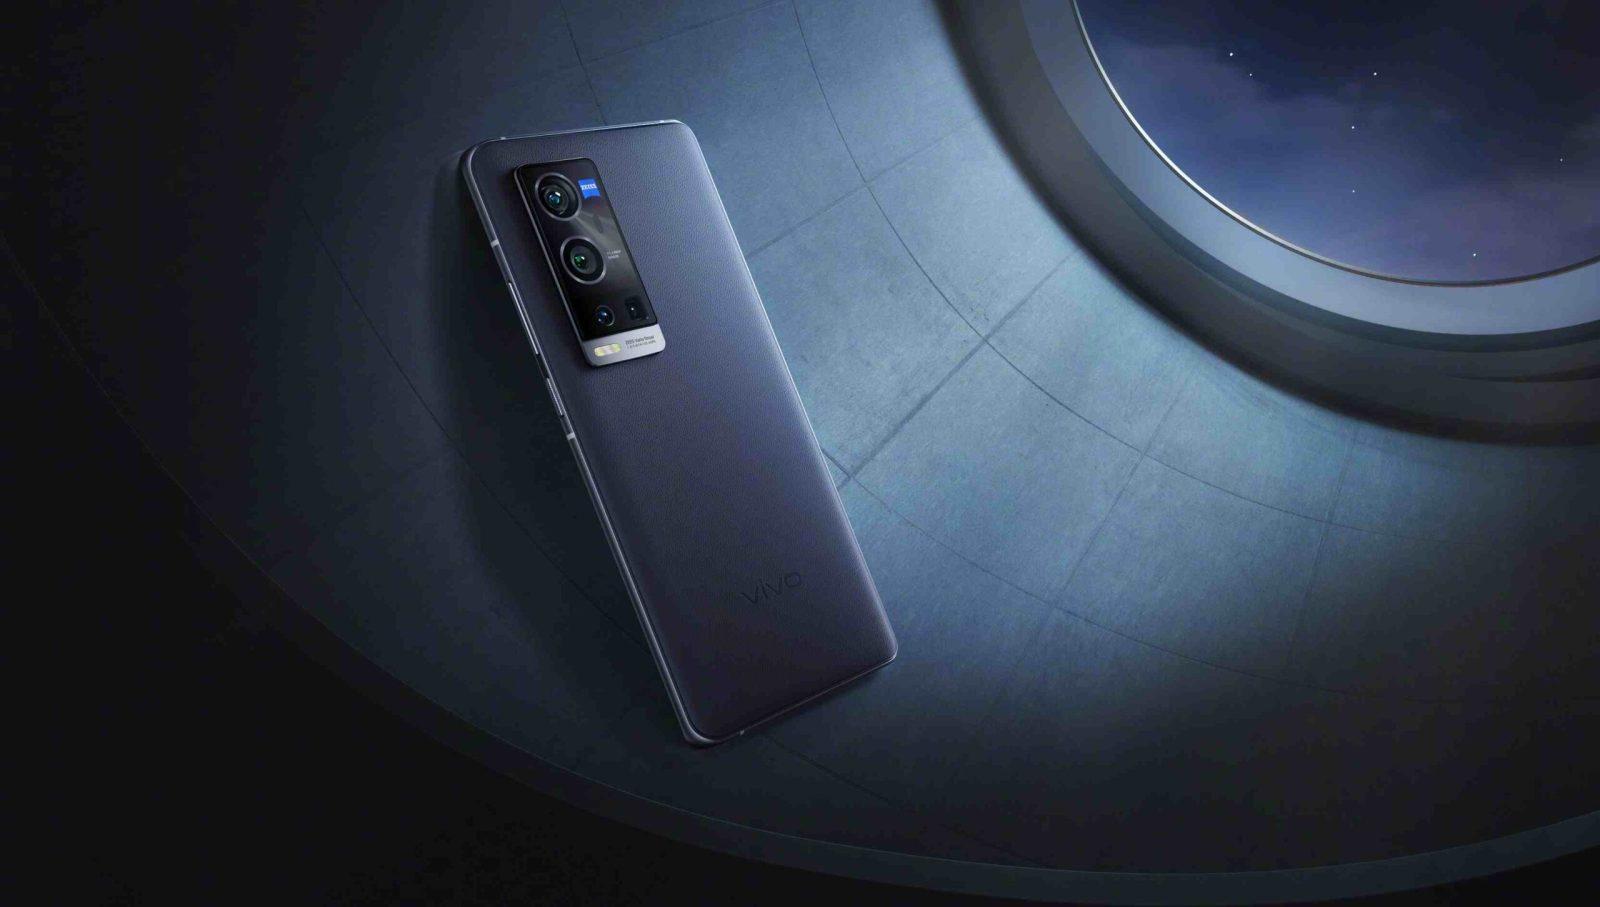 VIVO X60 Pro Plus 5G Specifications, VIVO X60 Pro Plus 5G price in india